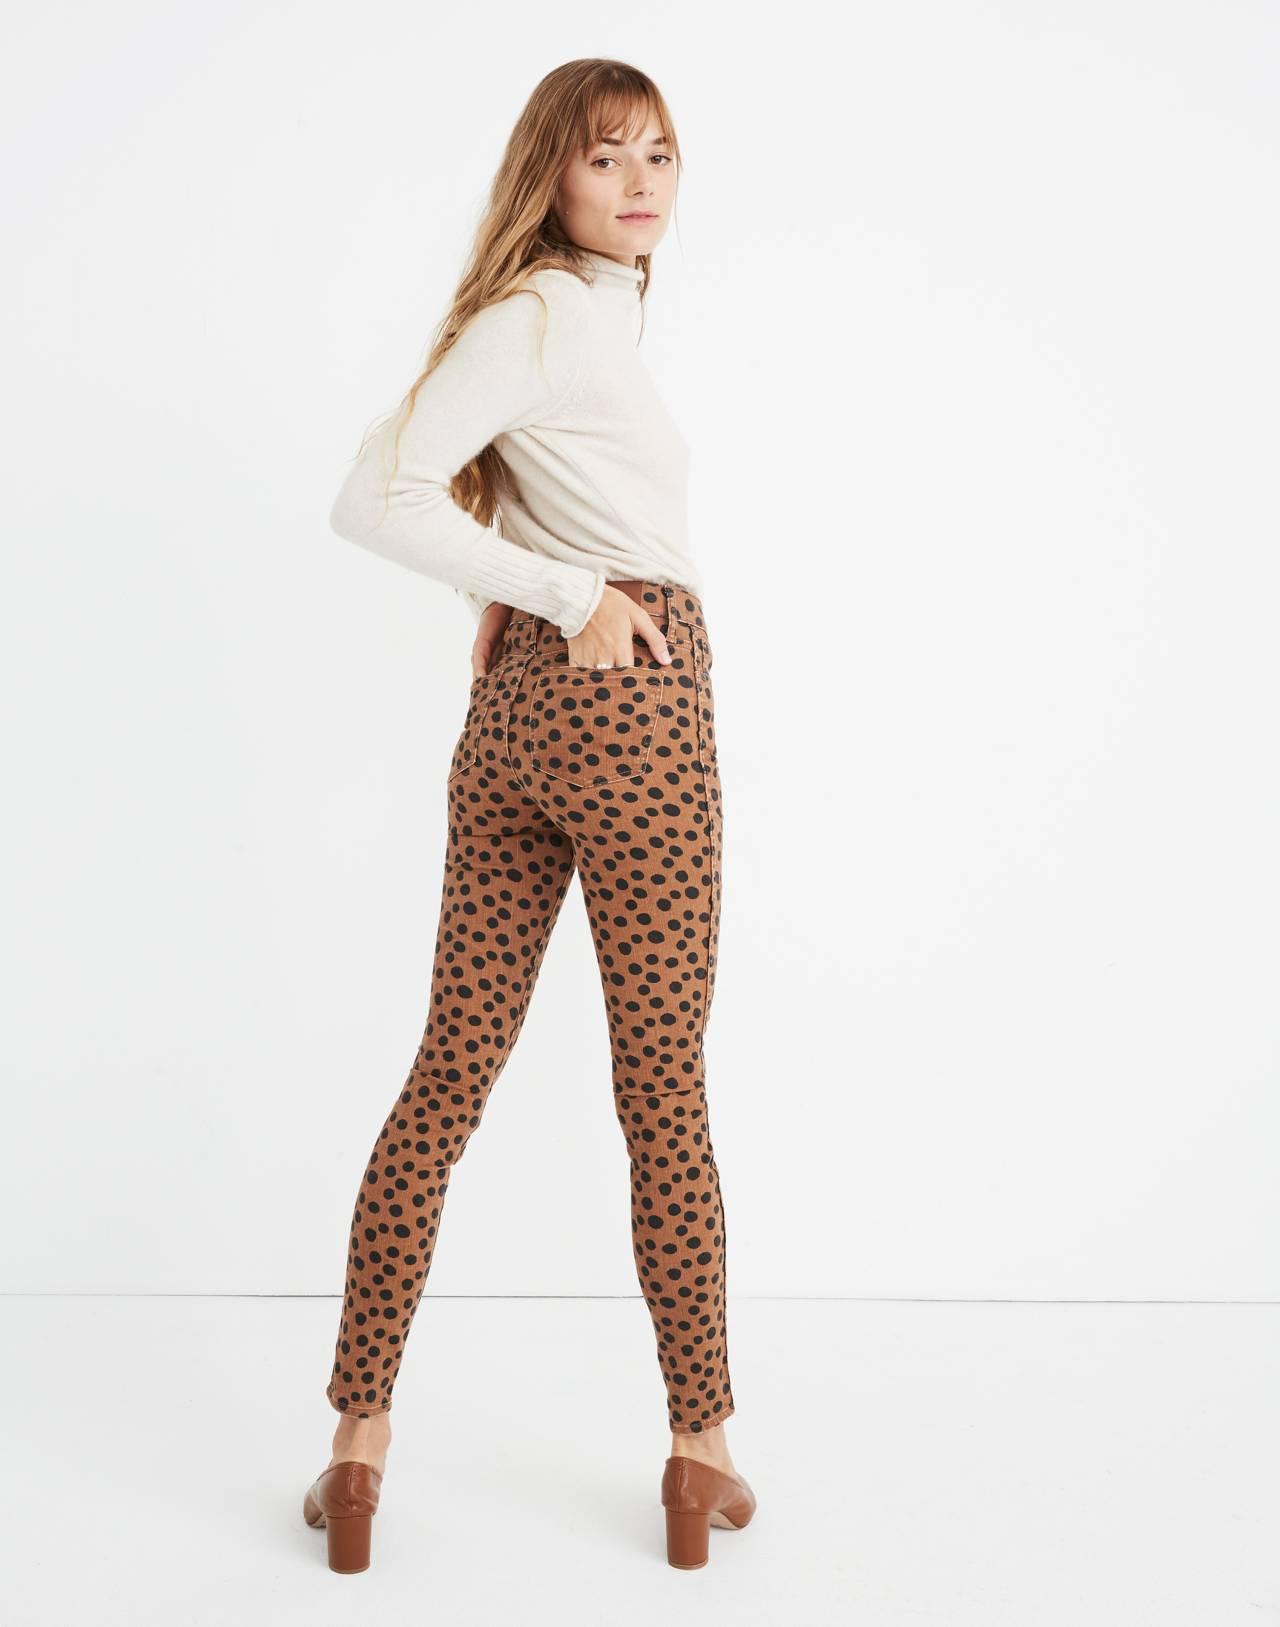 "10"" High-Rise Skinny Jeans in Leopard Dot in leopard dot image 3"